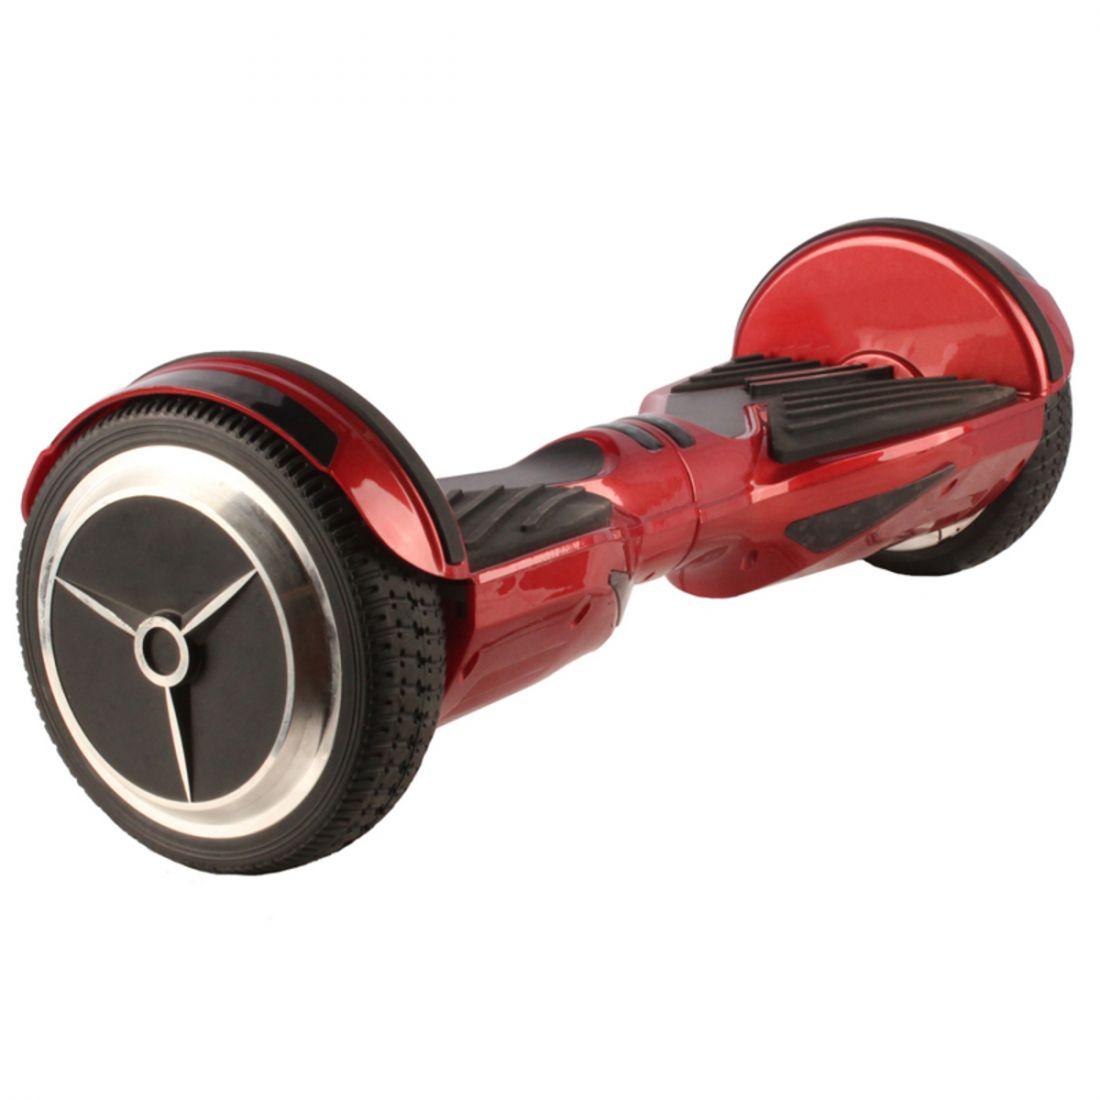 "Гироскутер Smart Balance Wheel GENESIS 6.5"" с двумя аккумуляторами"